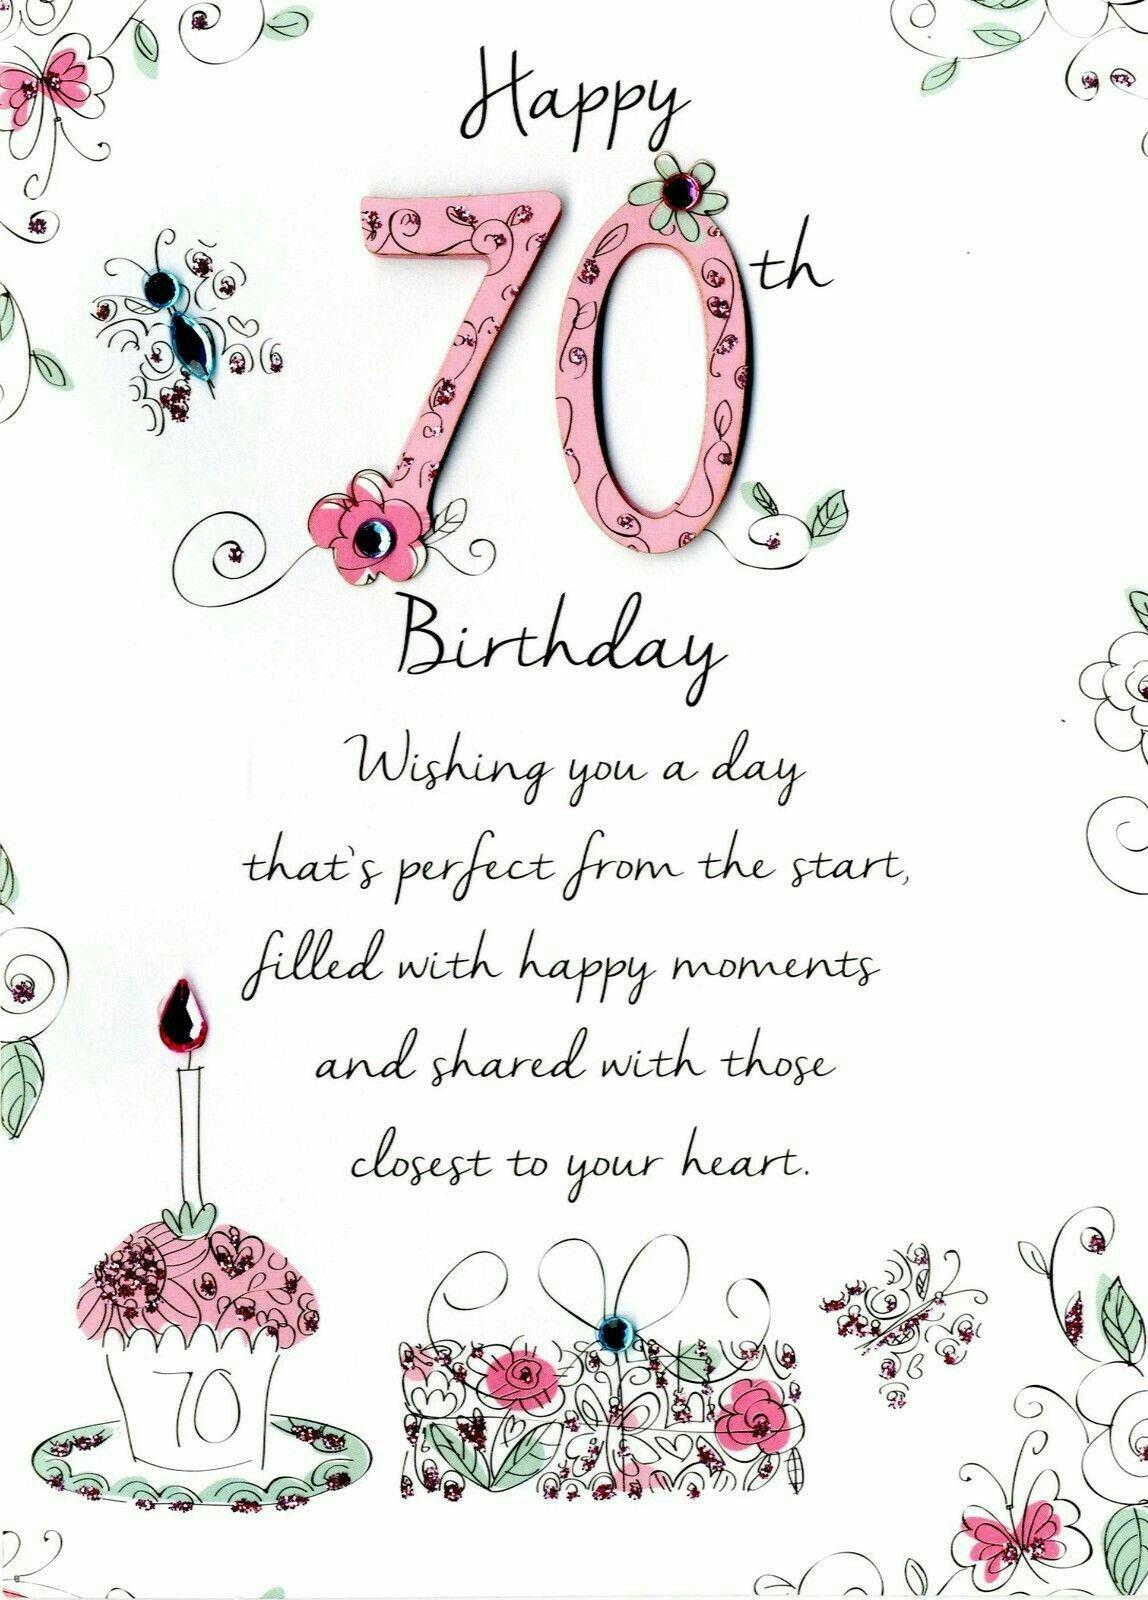 Birthday card sayings happy birthday quotes happy birthday wishes birthday verses birthday